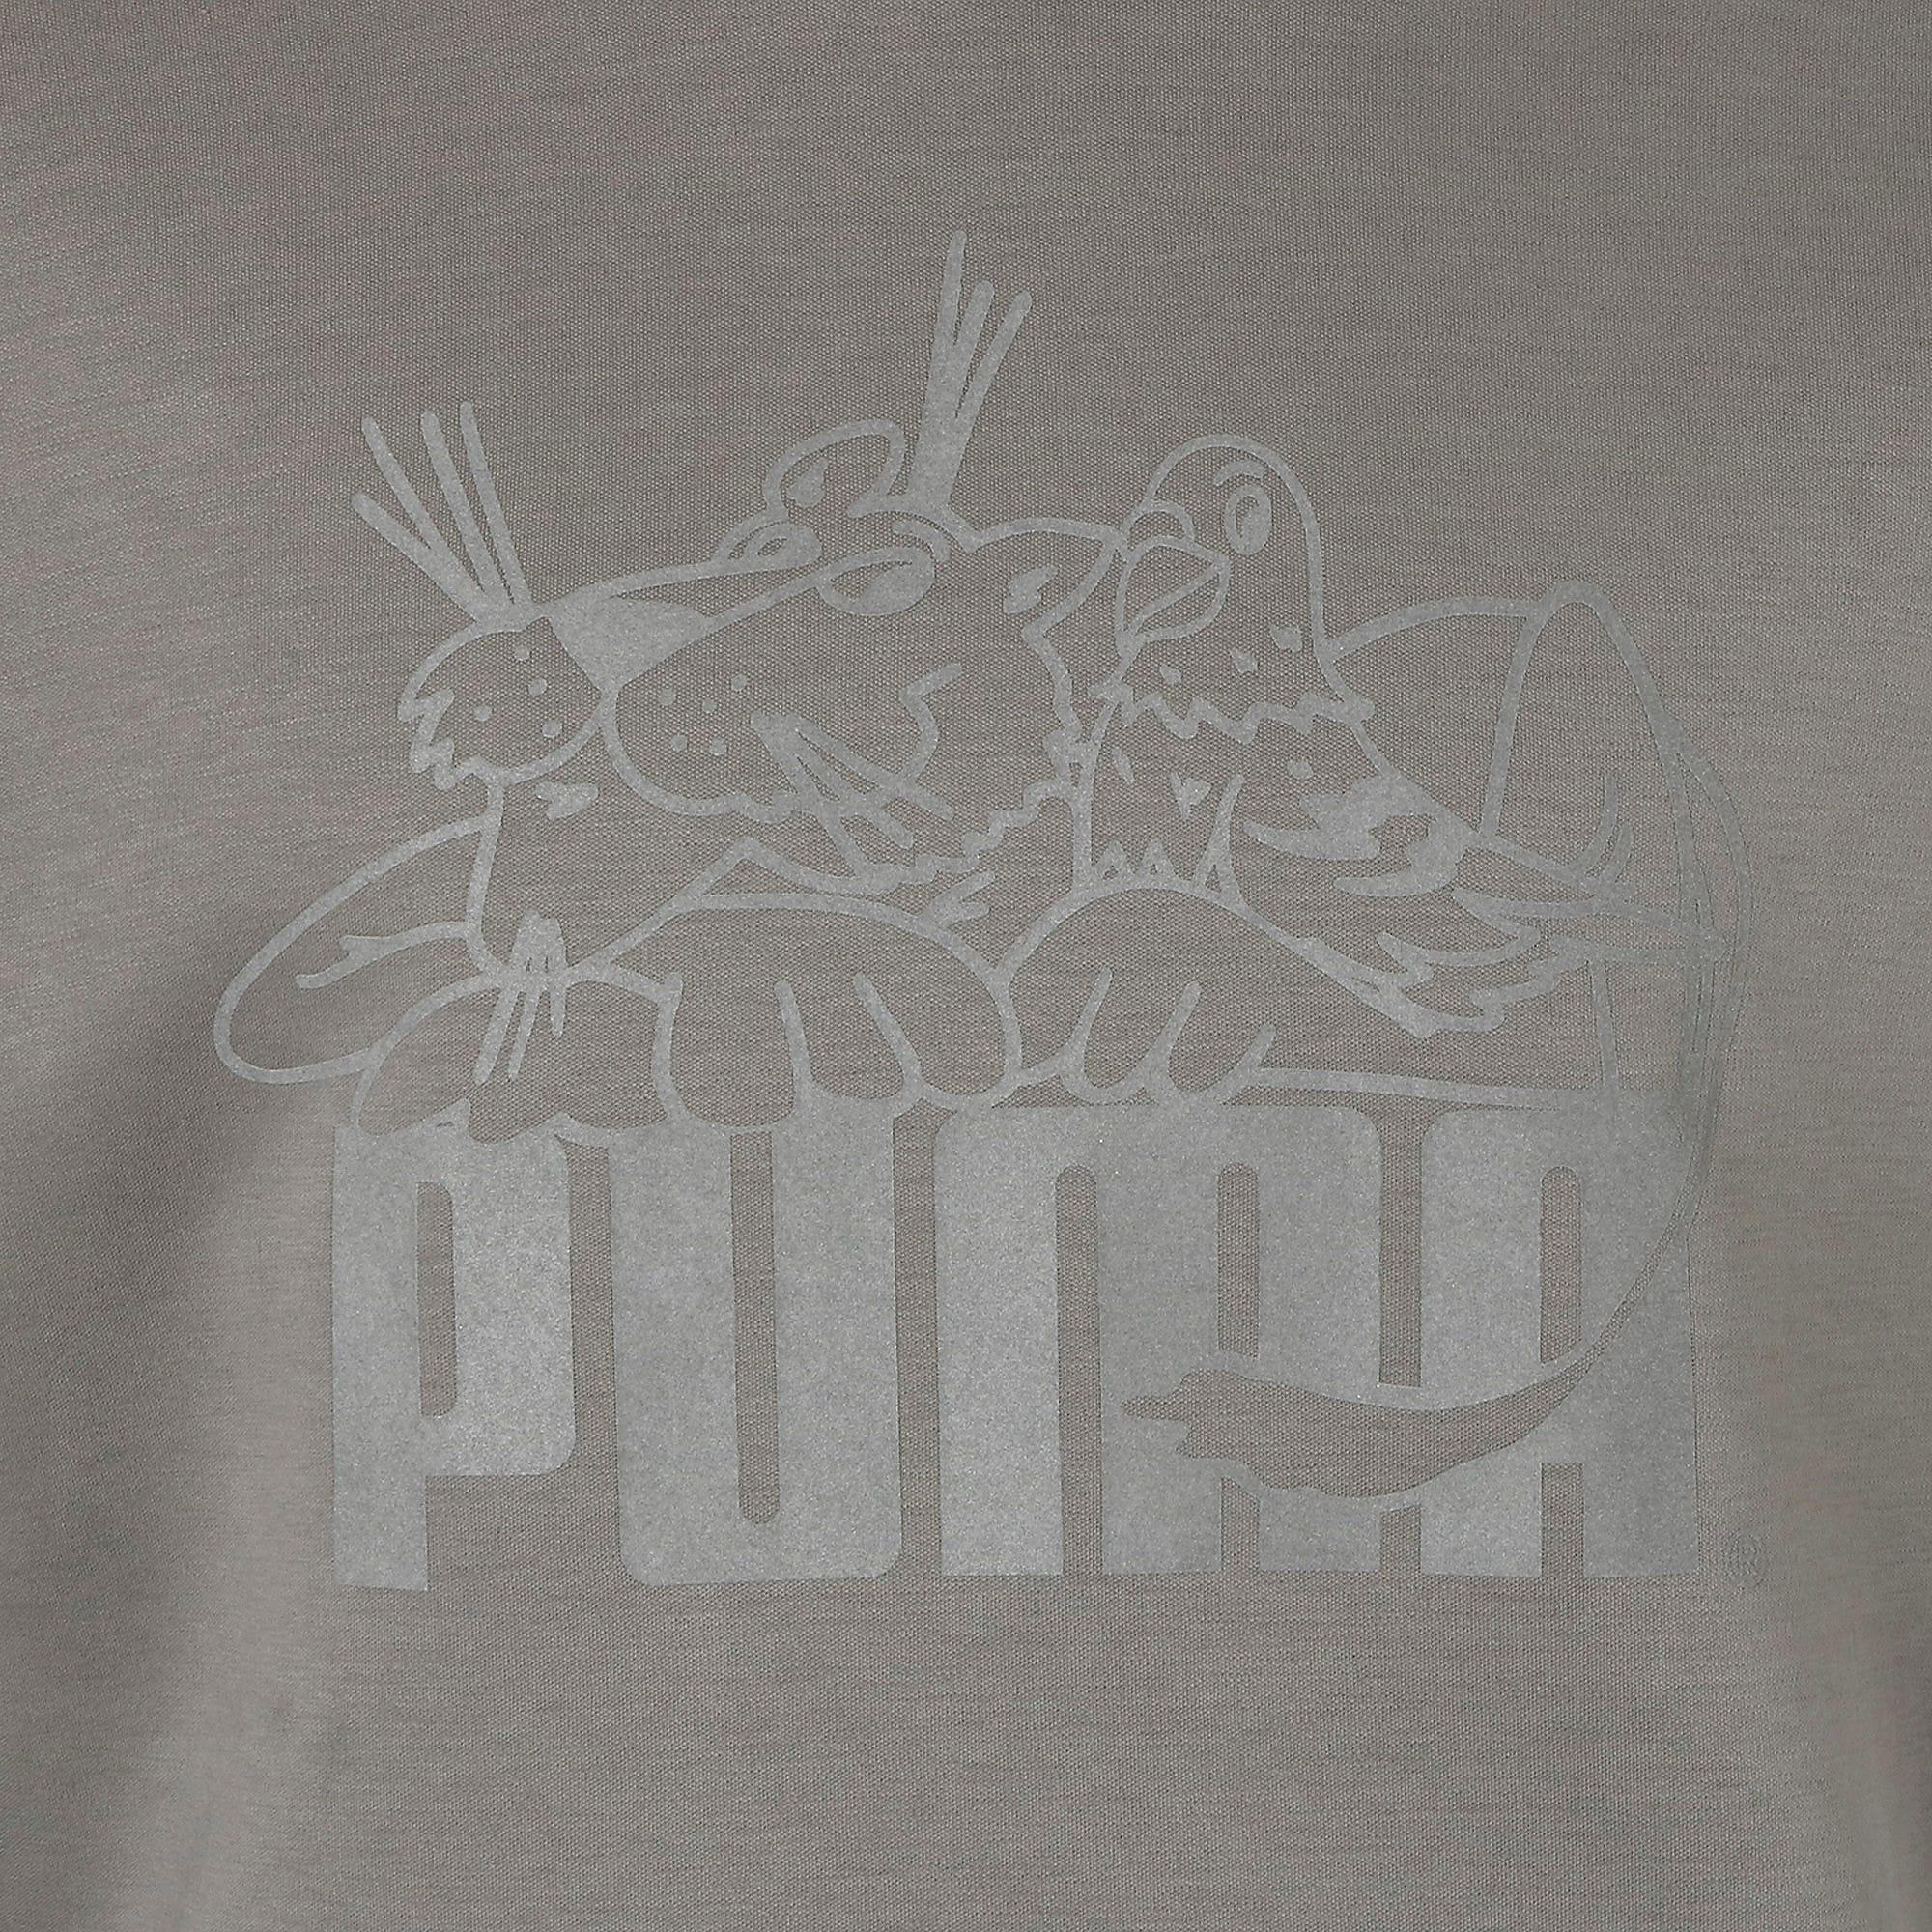 Thumbnail 3 of PUMA x STAPLE T7 HOODIE, Limestone, medium-JPN